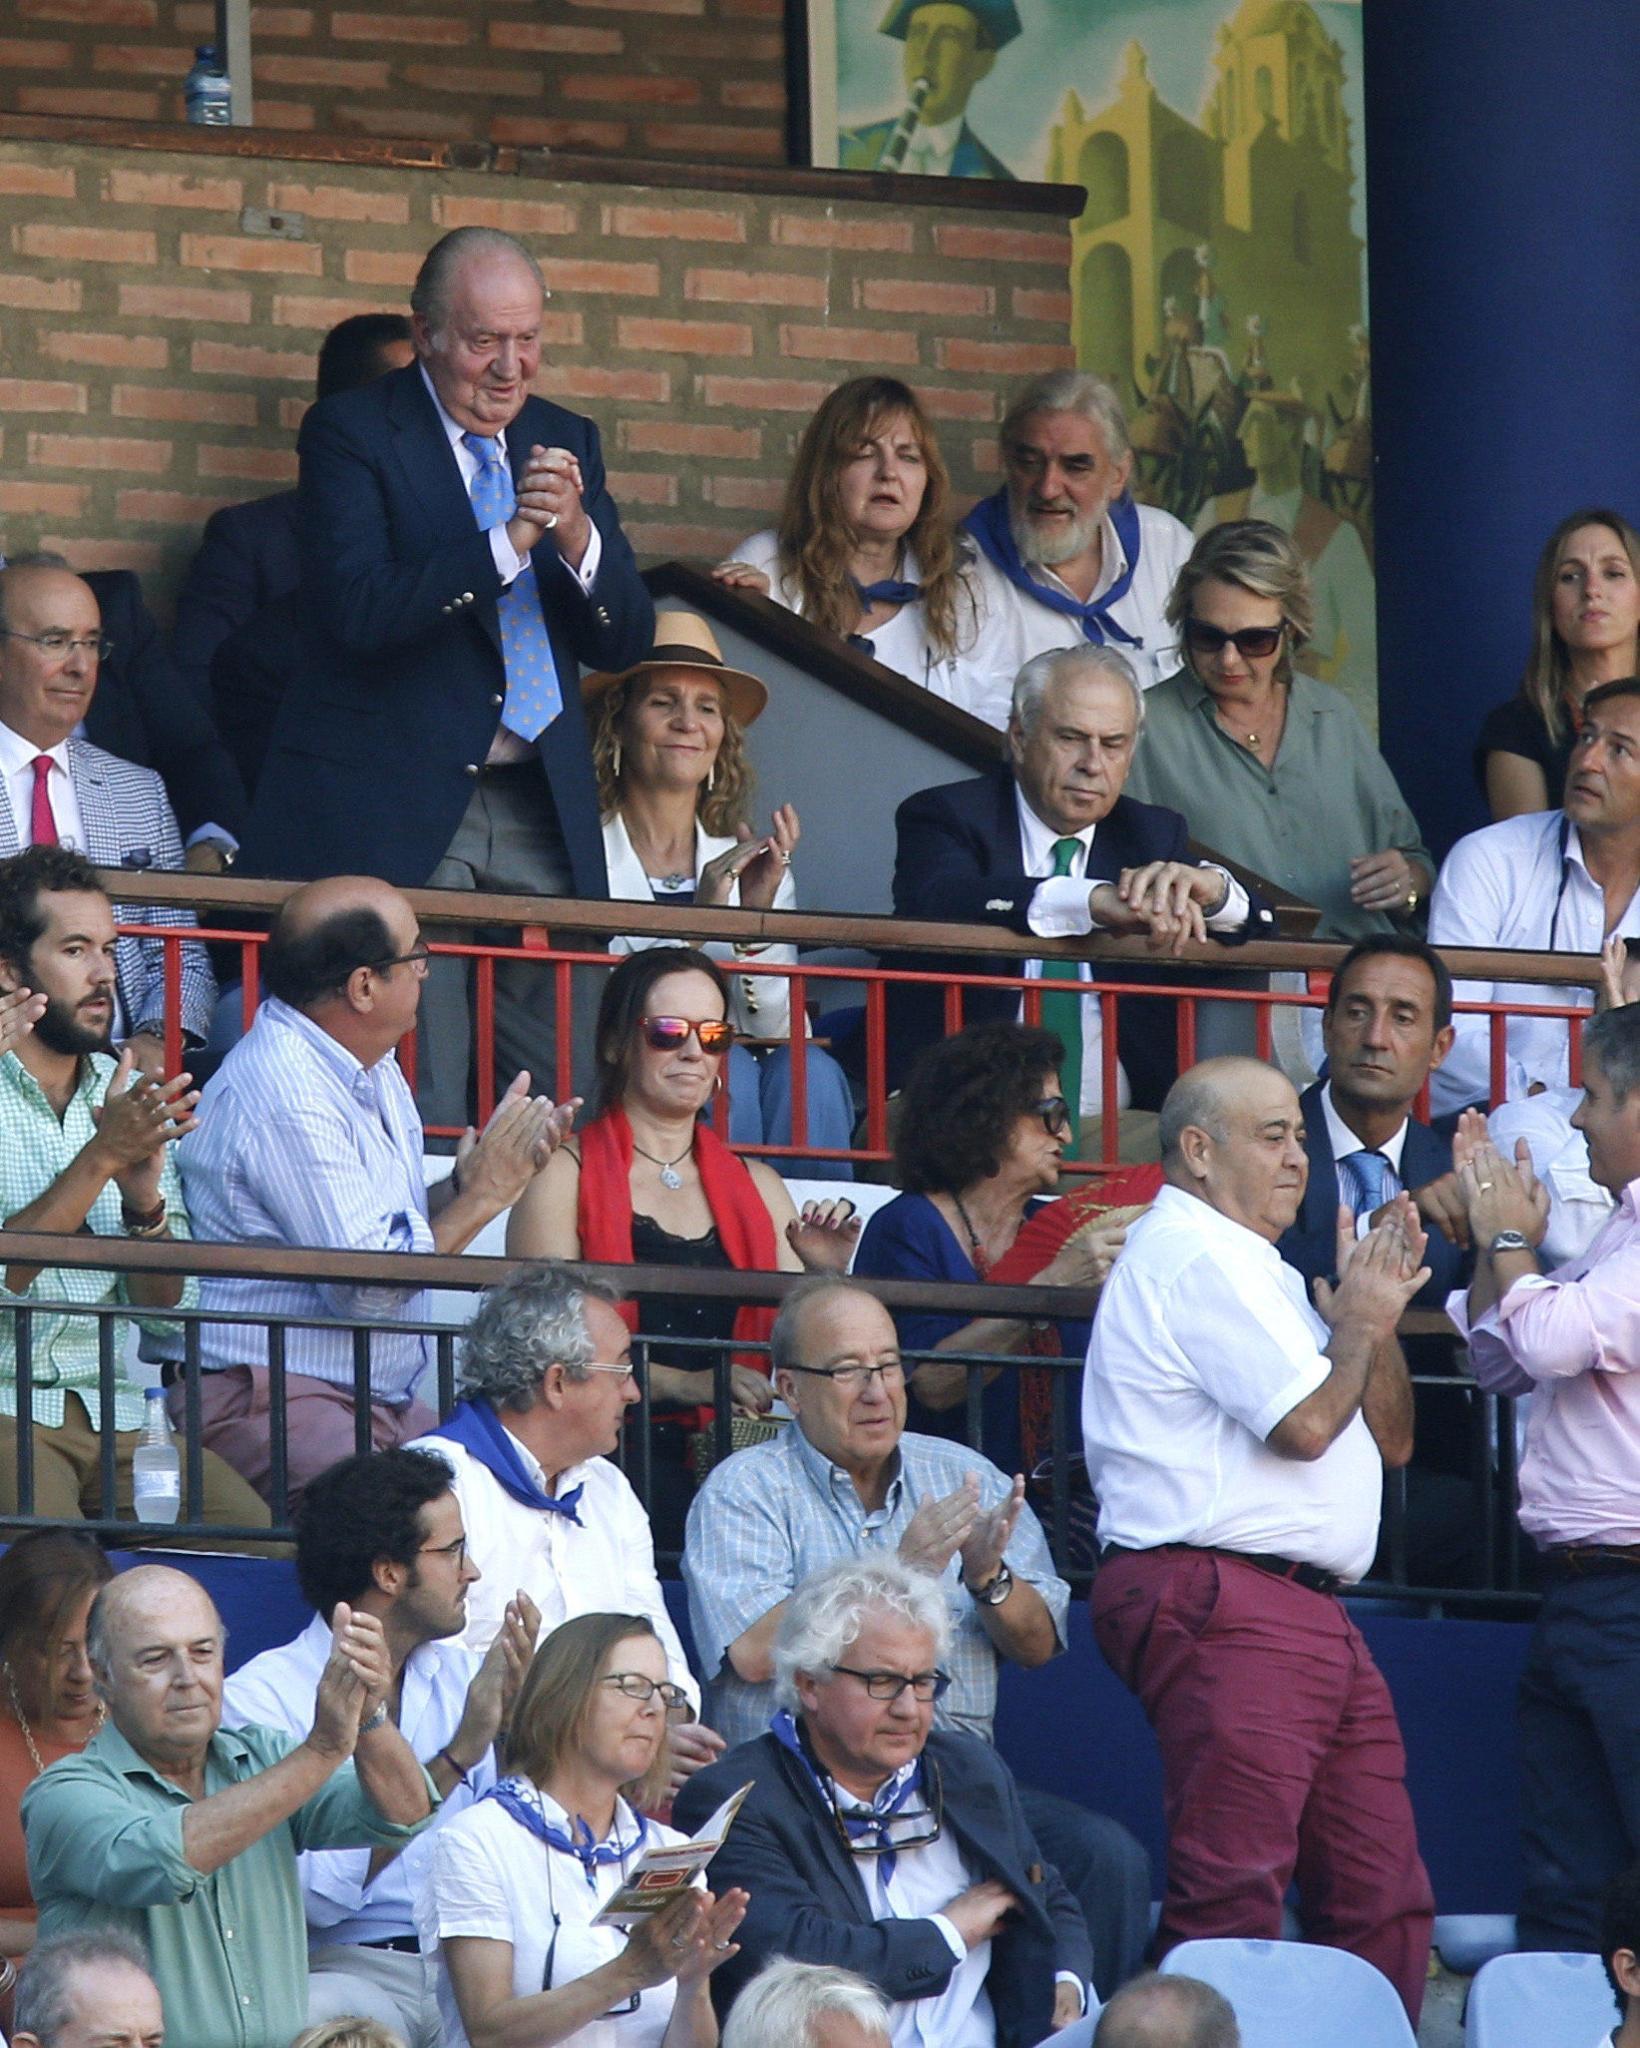 In Bilbao wird König Juan Carlos mit Applaus begrüßt - er ist seit langer Zeit Stierkampf-Fan.